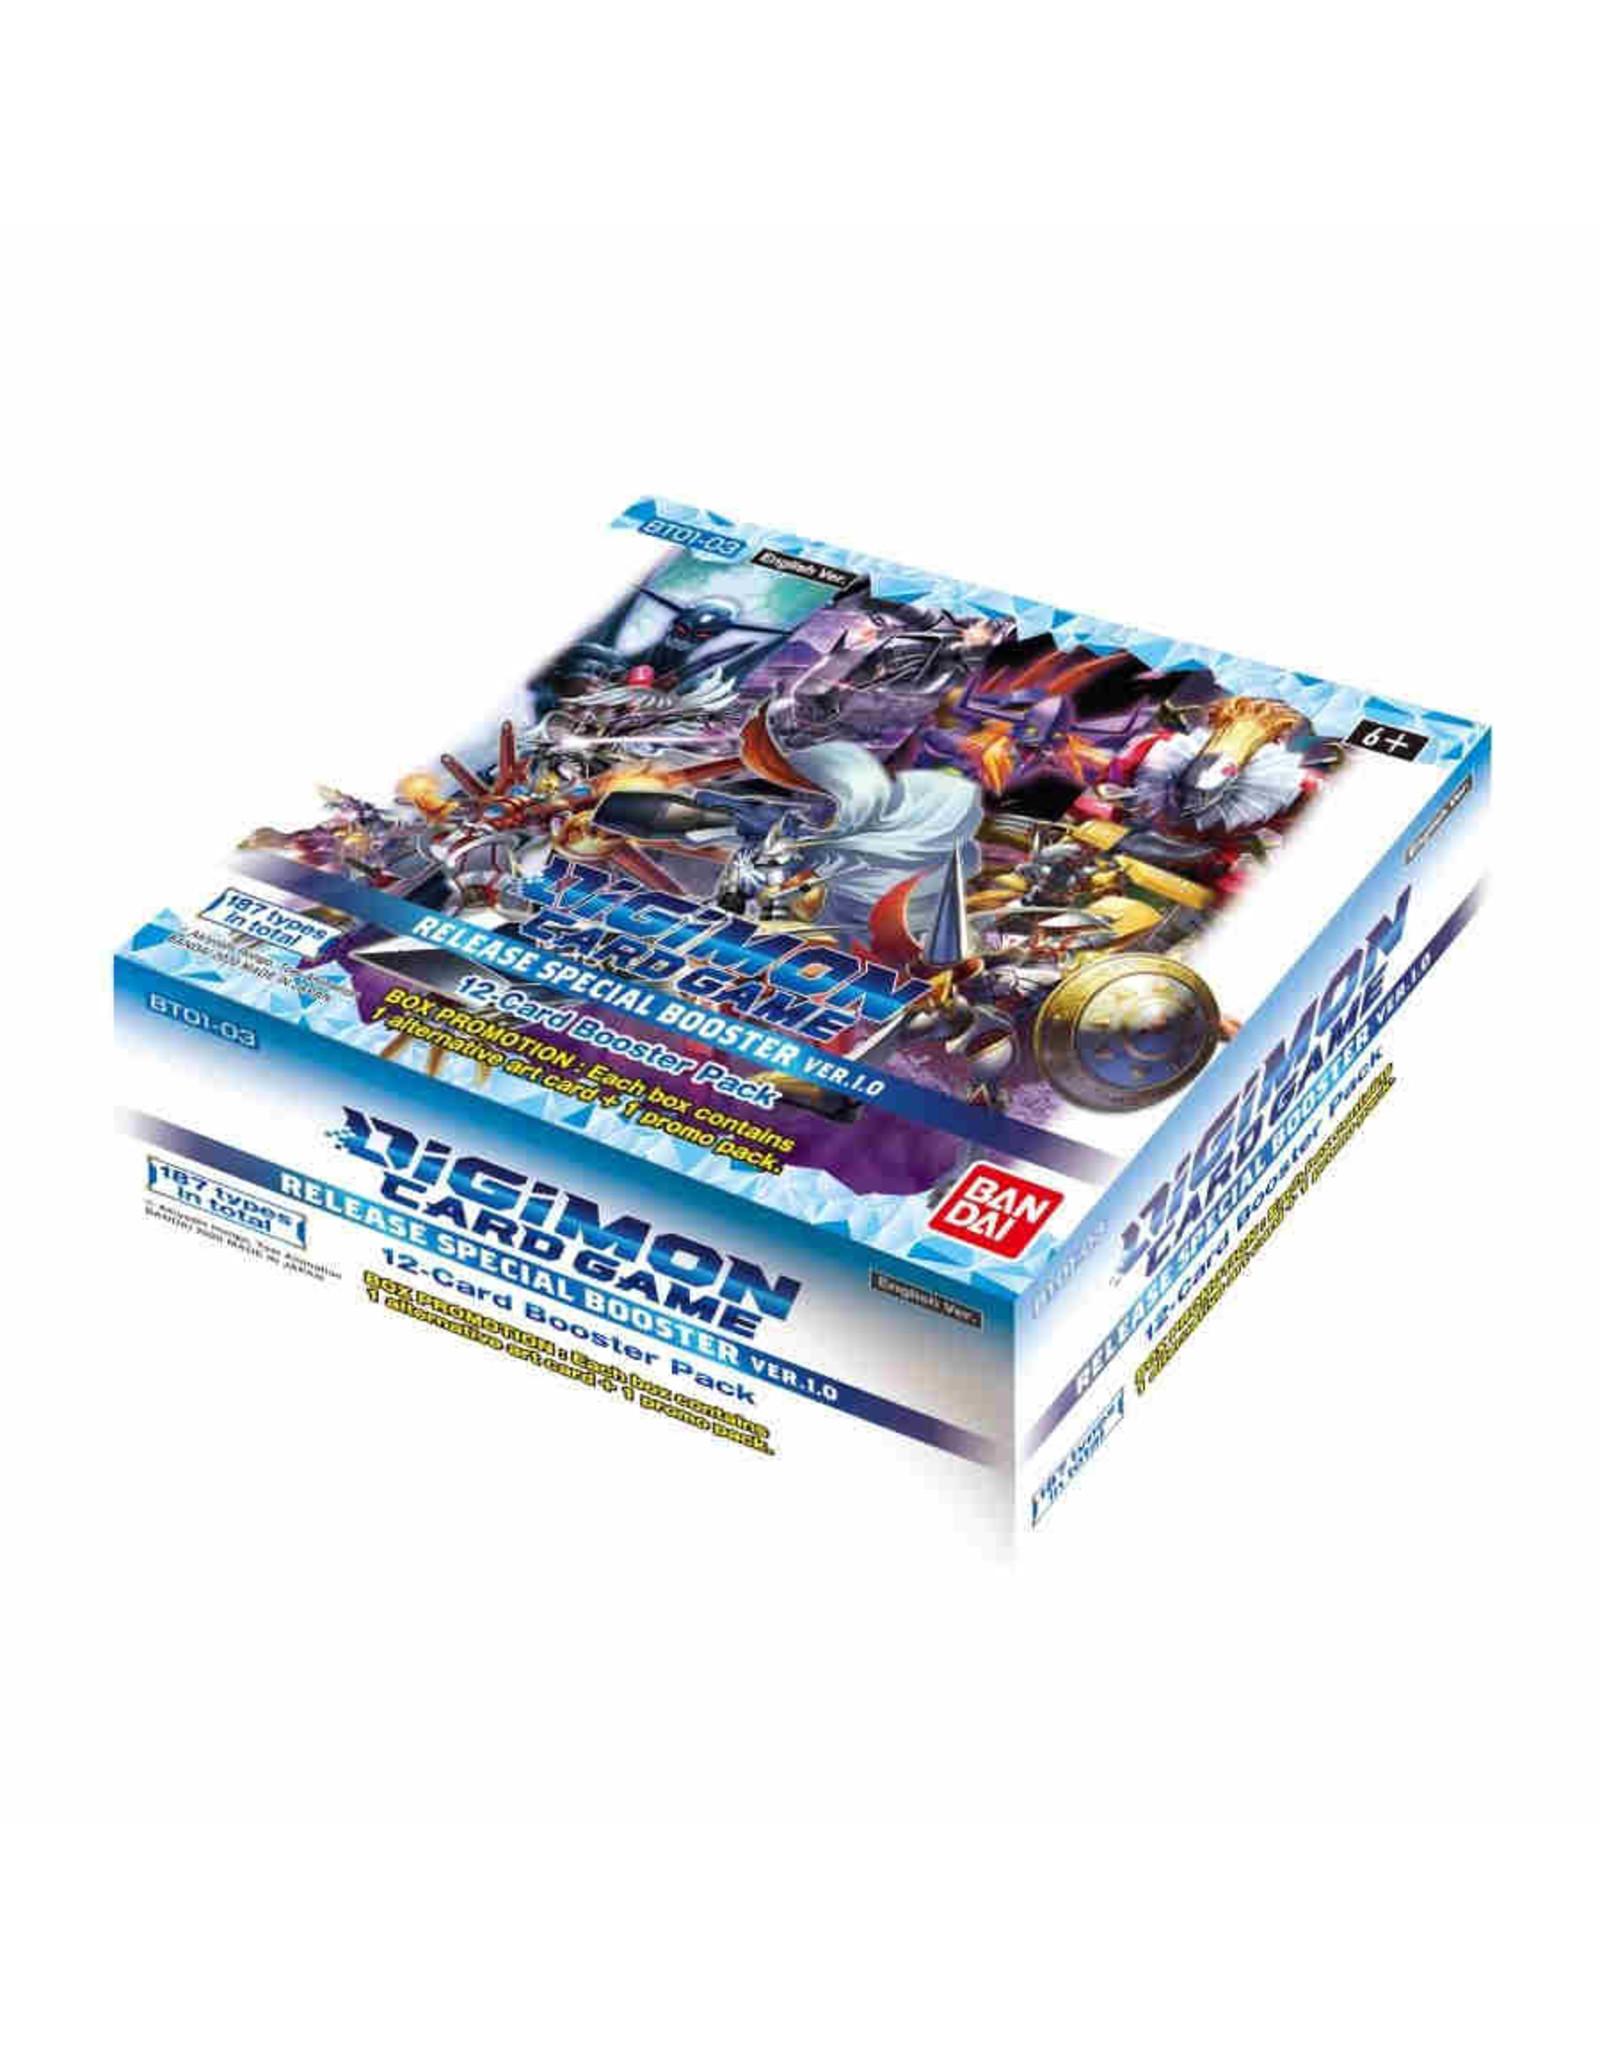 Bandai Digimon V1.0 Booster Box